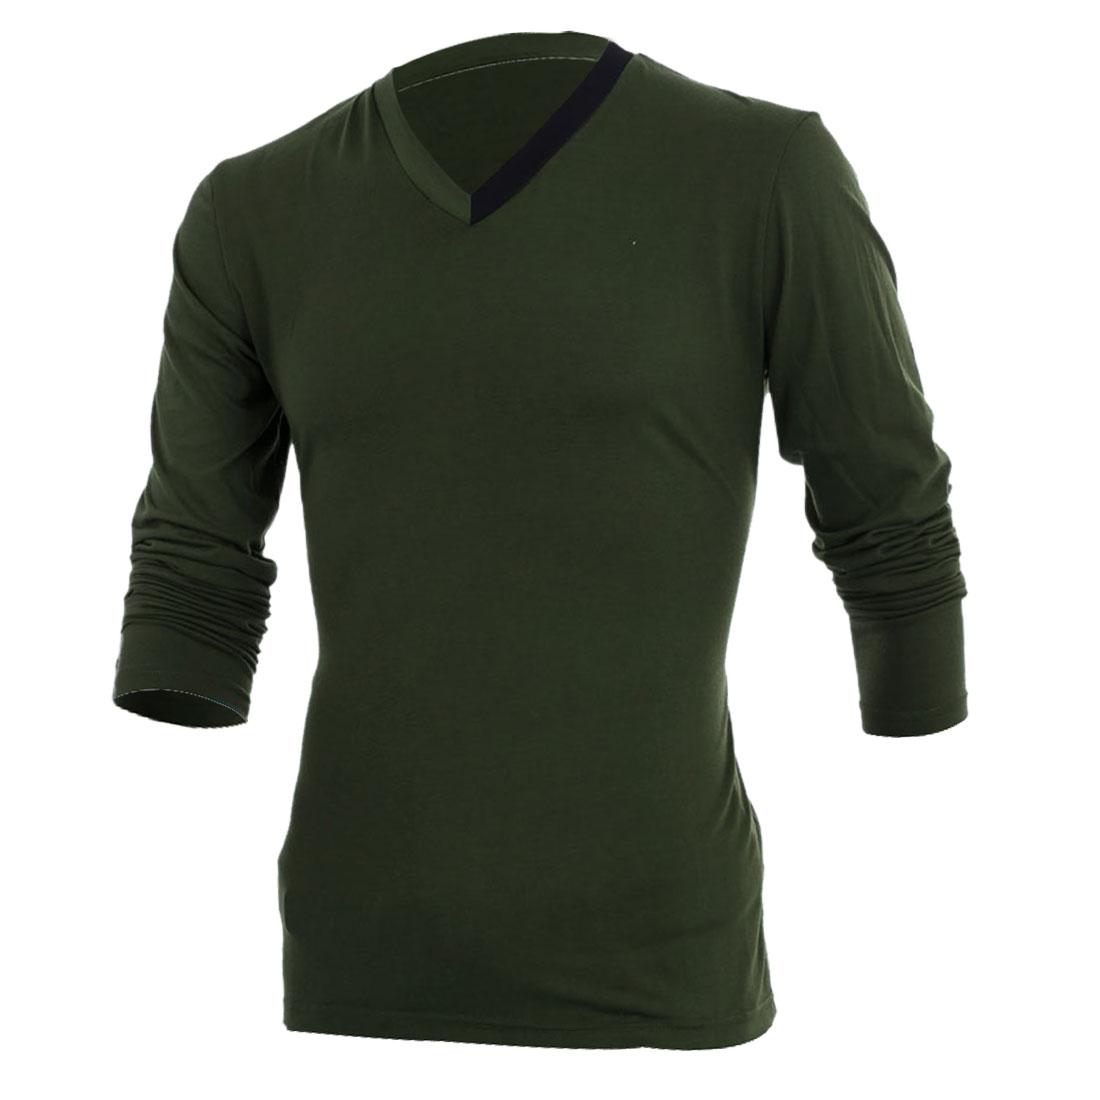 Stylish Mans Olive Green V Neck Long Sleeve Slim Fit Top Shirt M